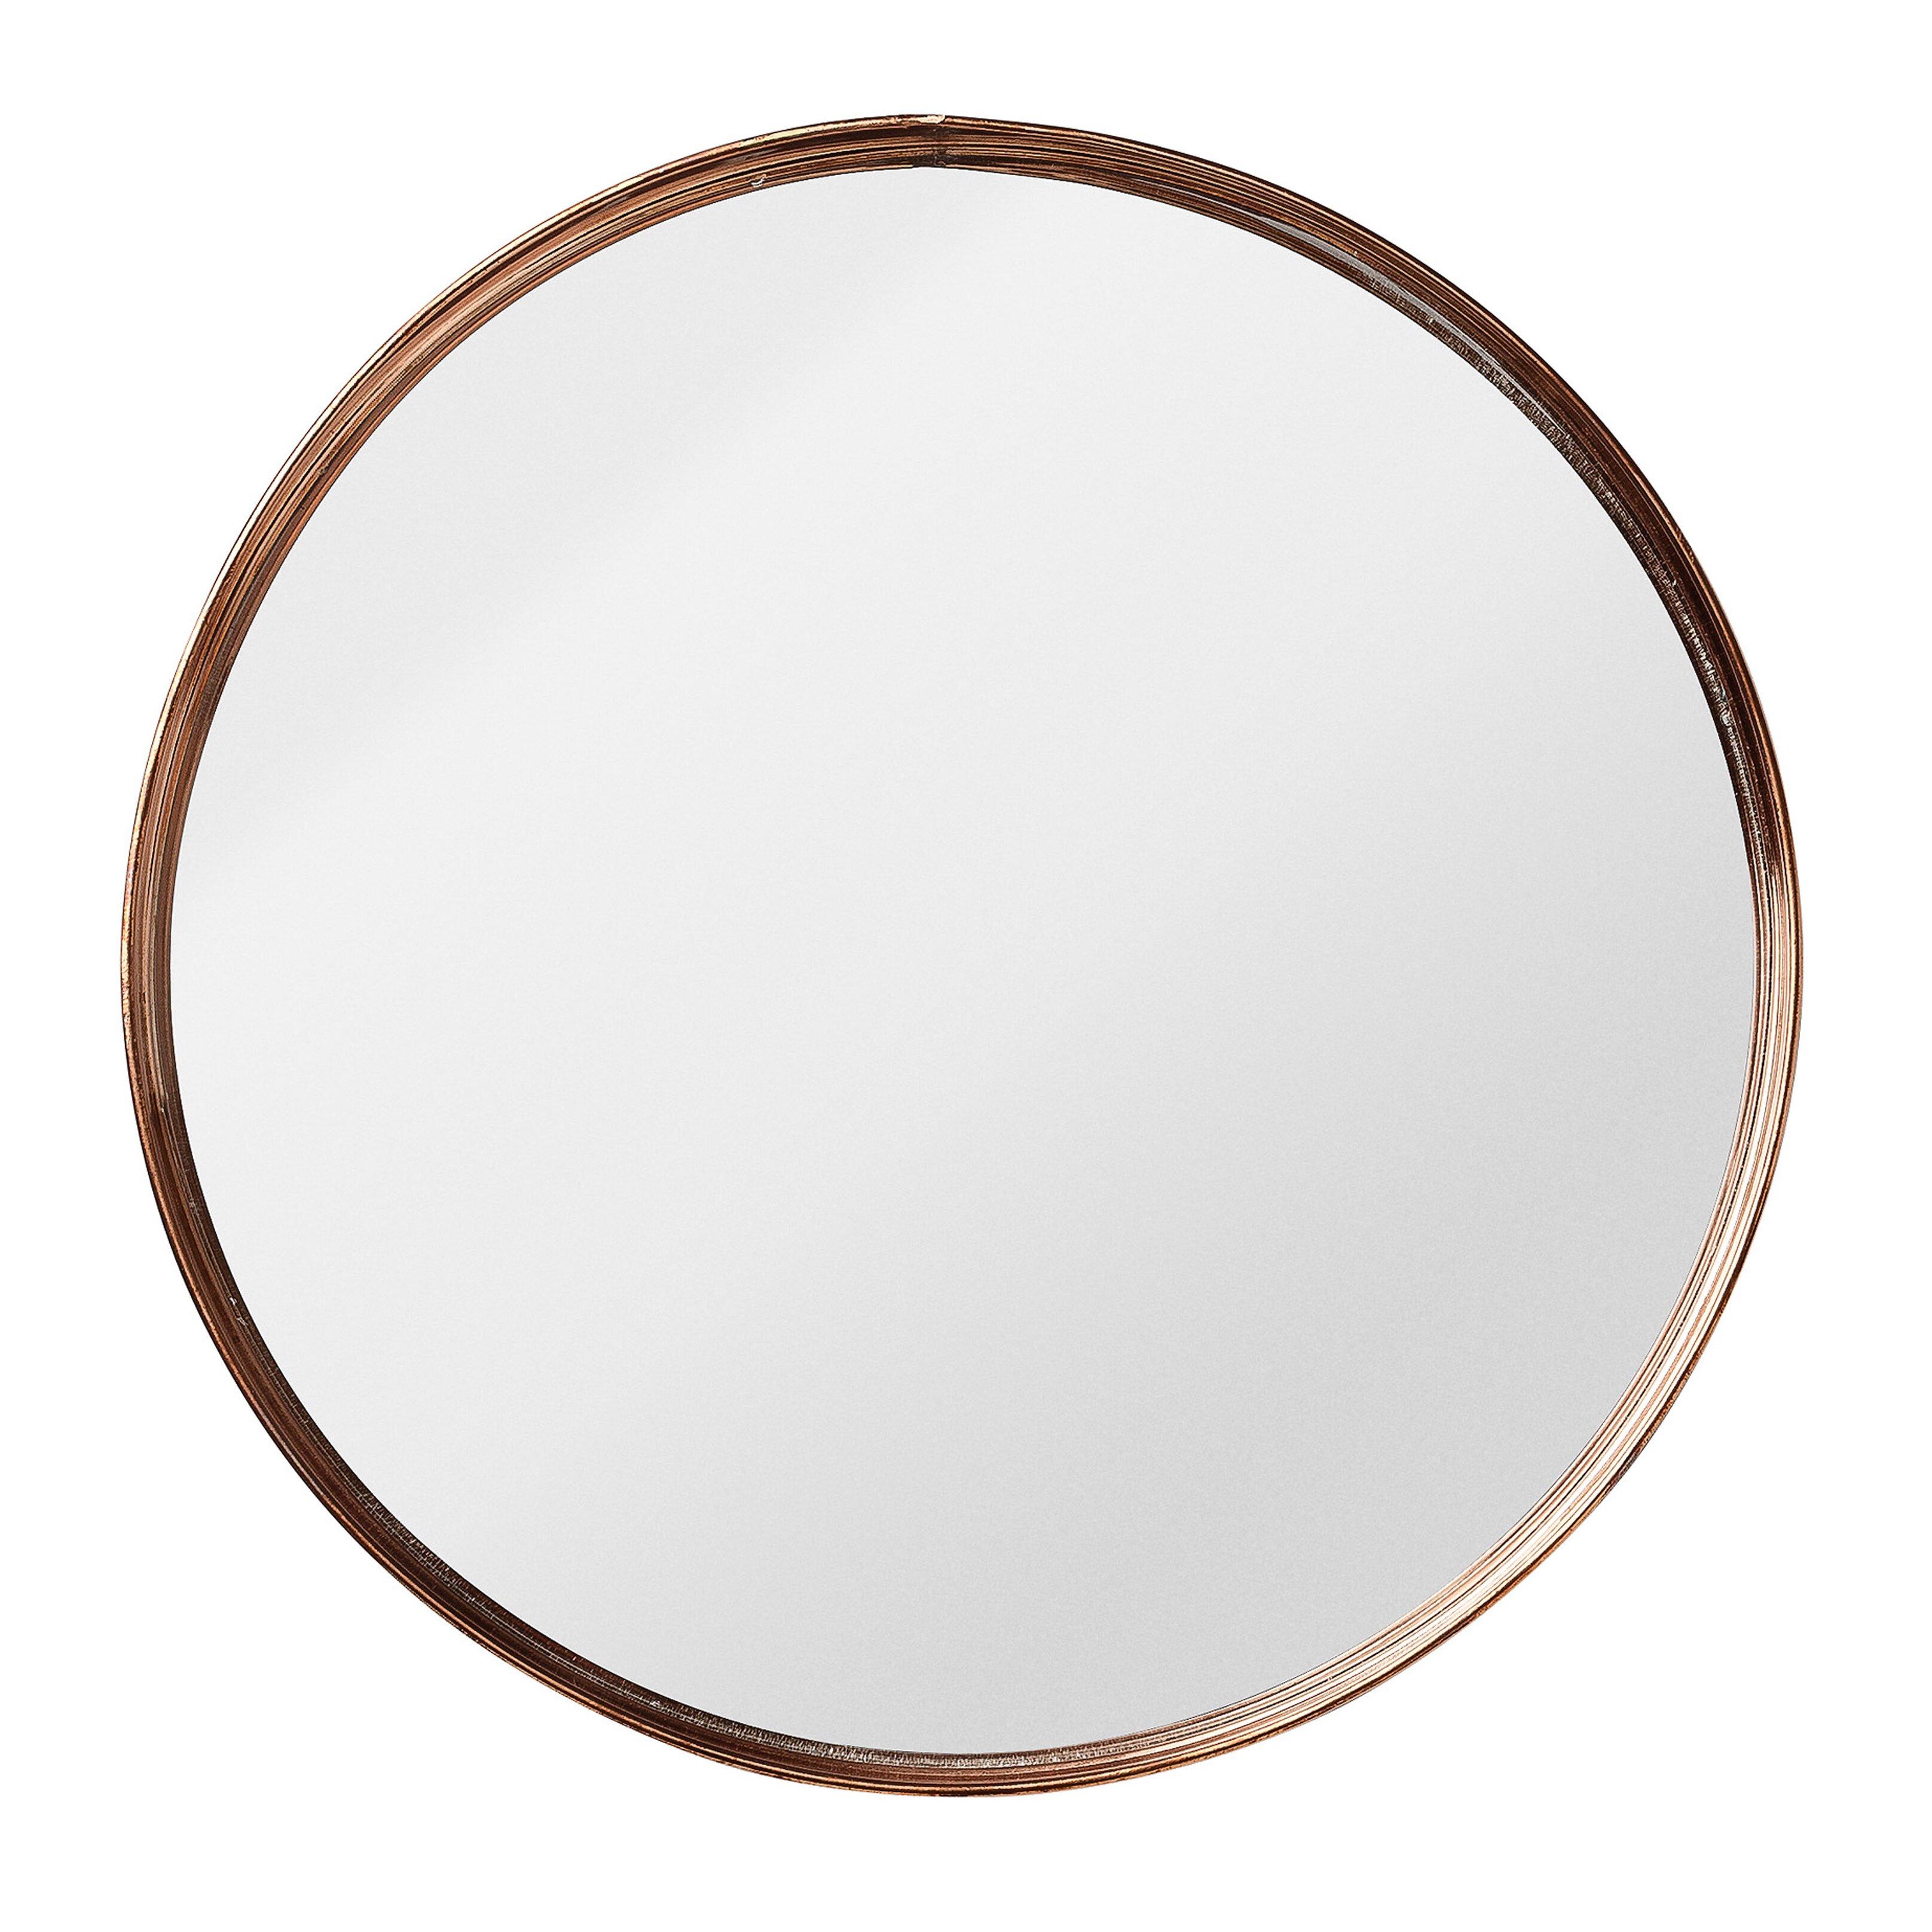 Round metal framed mirror wayfair for Miroir rond metal noir